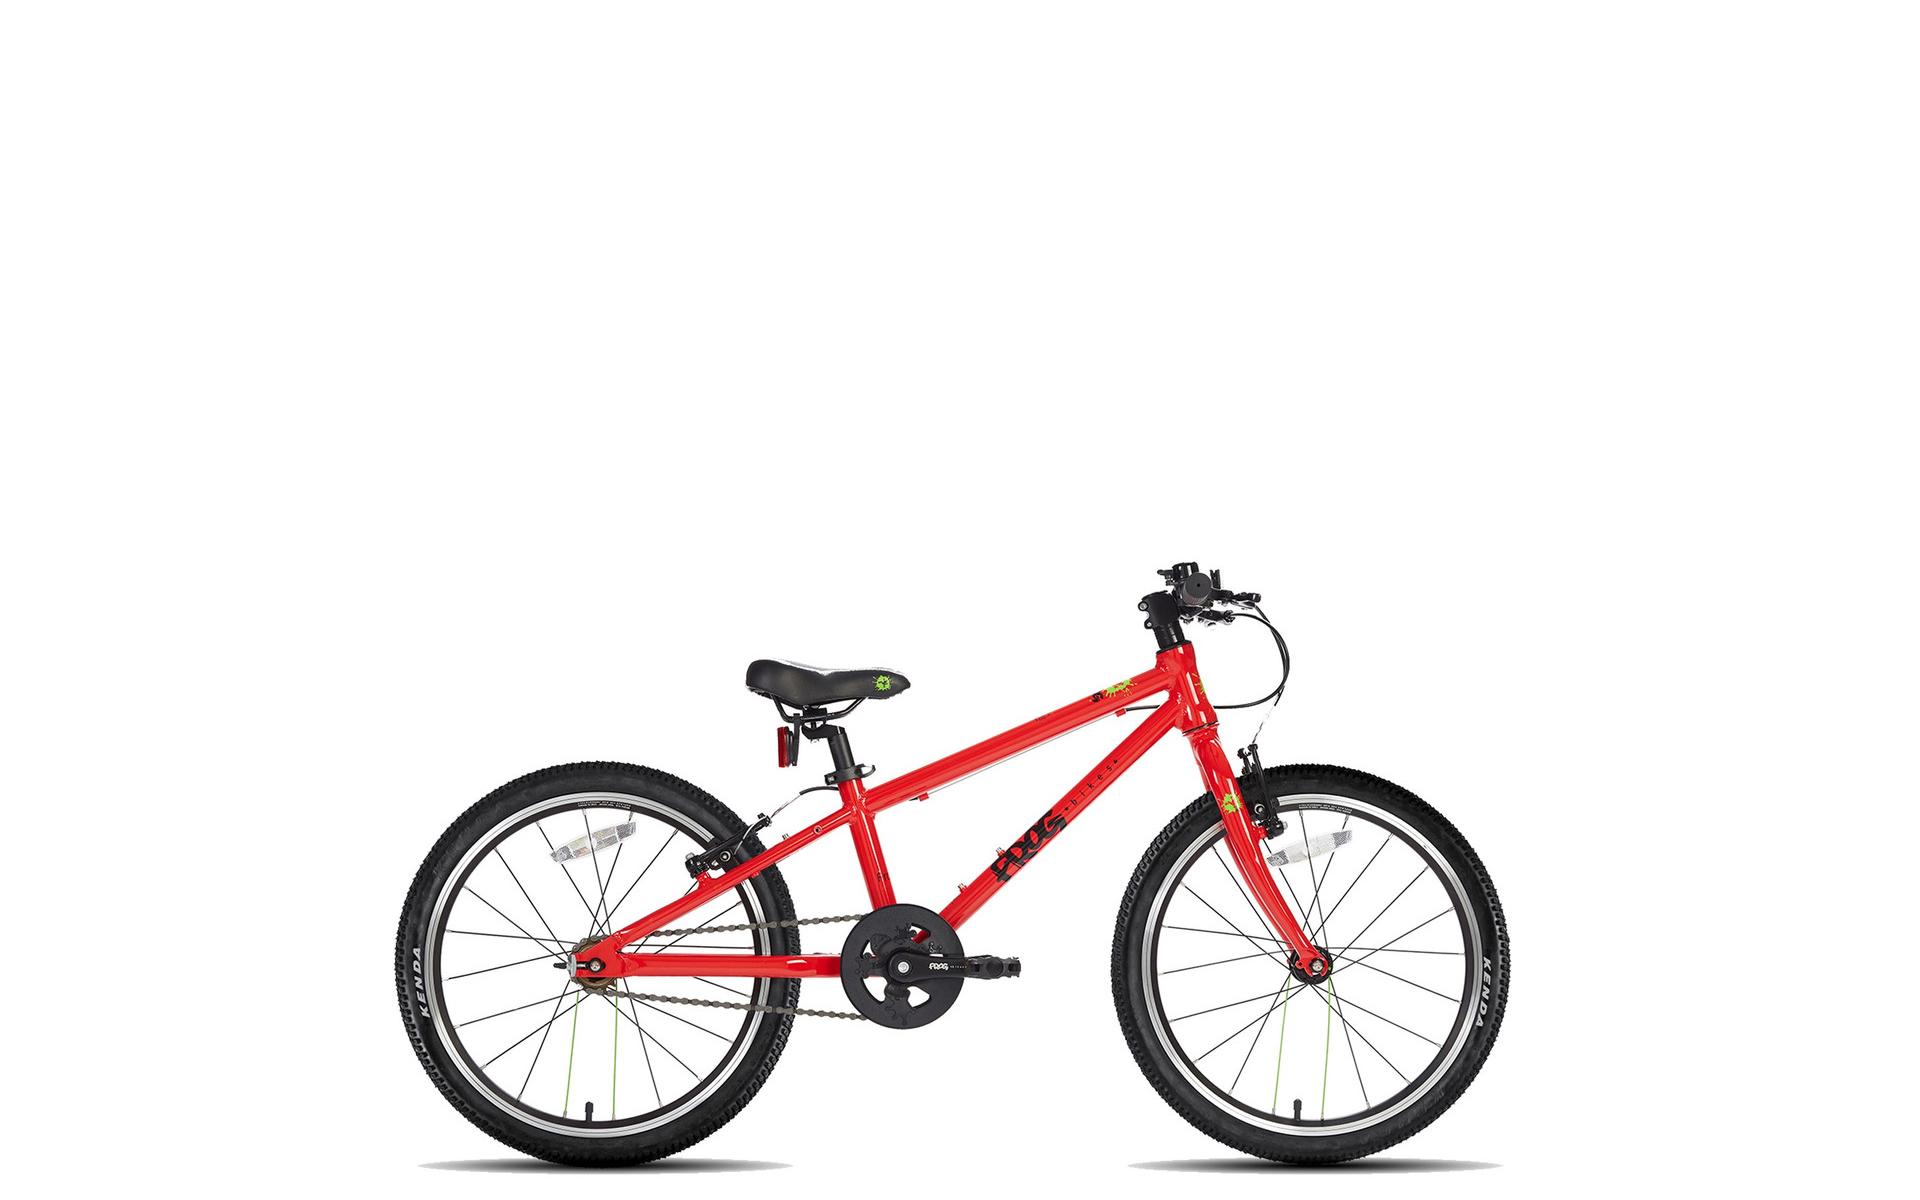 Frog cykel